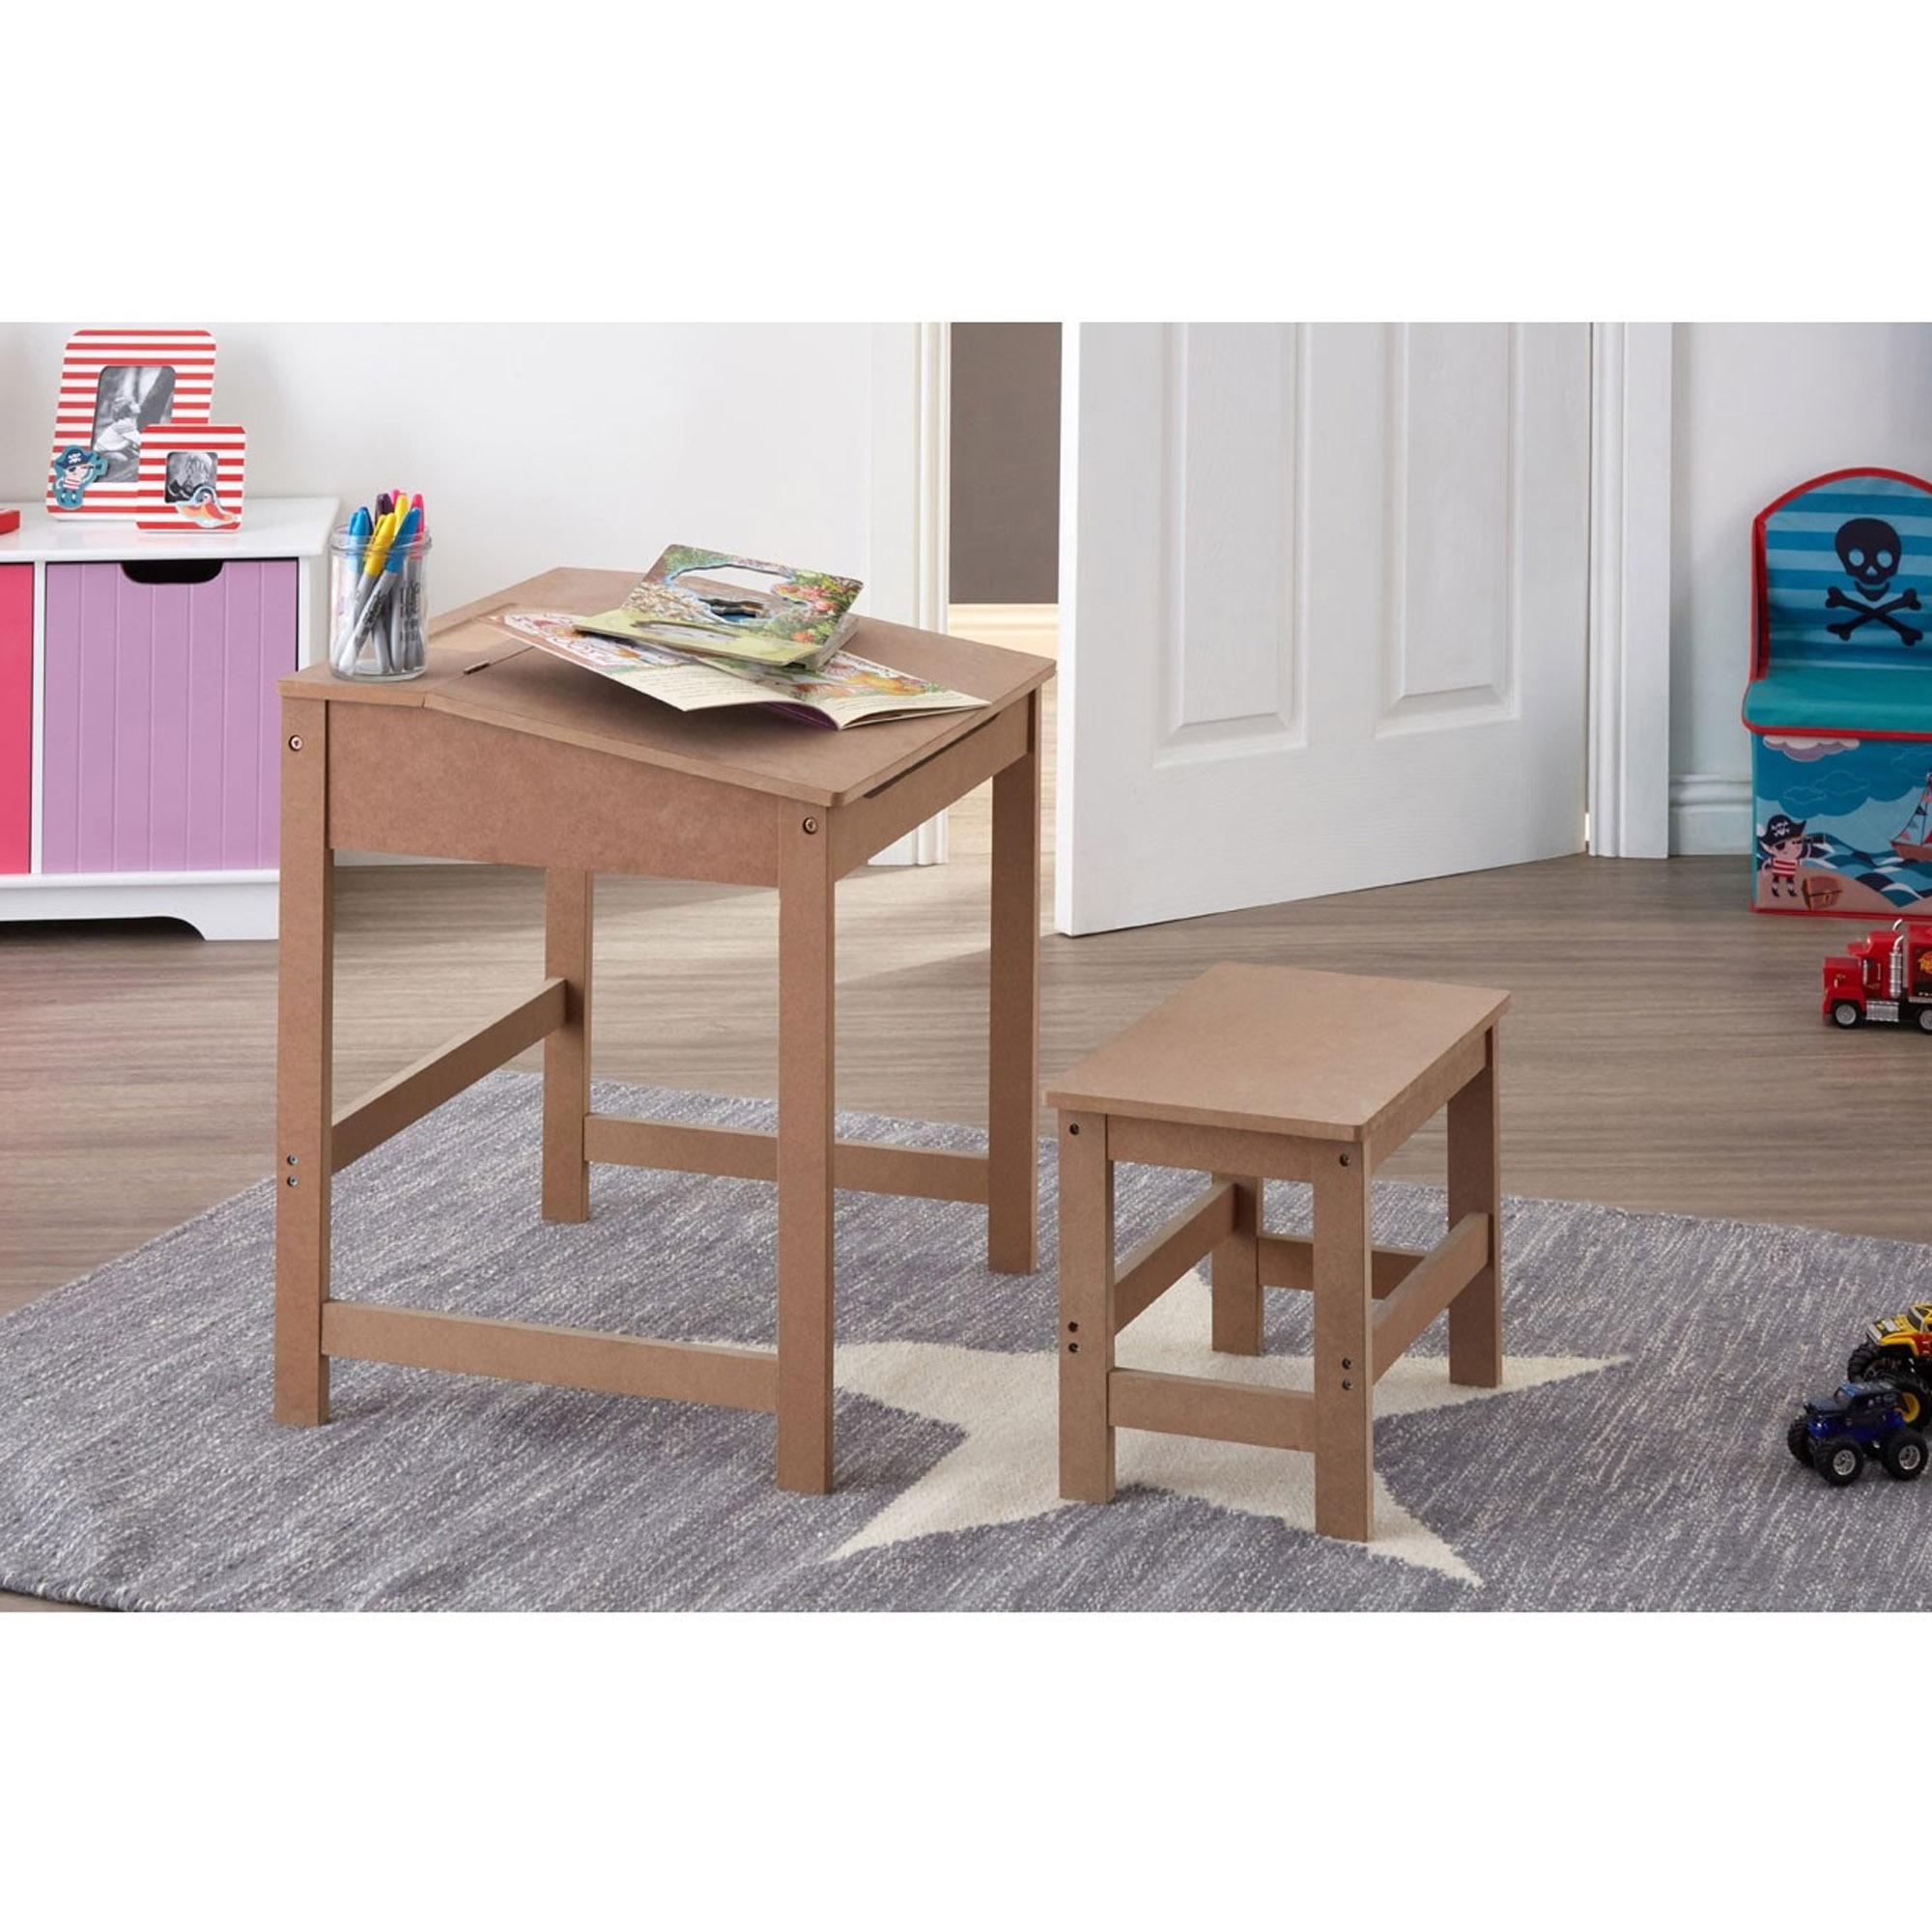 Magnificent Natural Kids Desk And Stool Download Free Architecture Designs Scobabritishbridgeorg